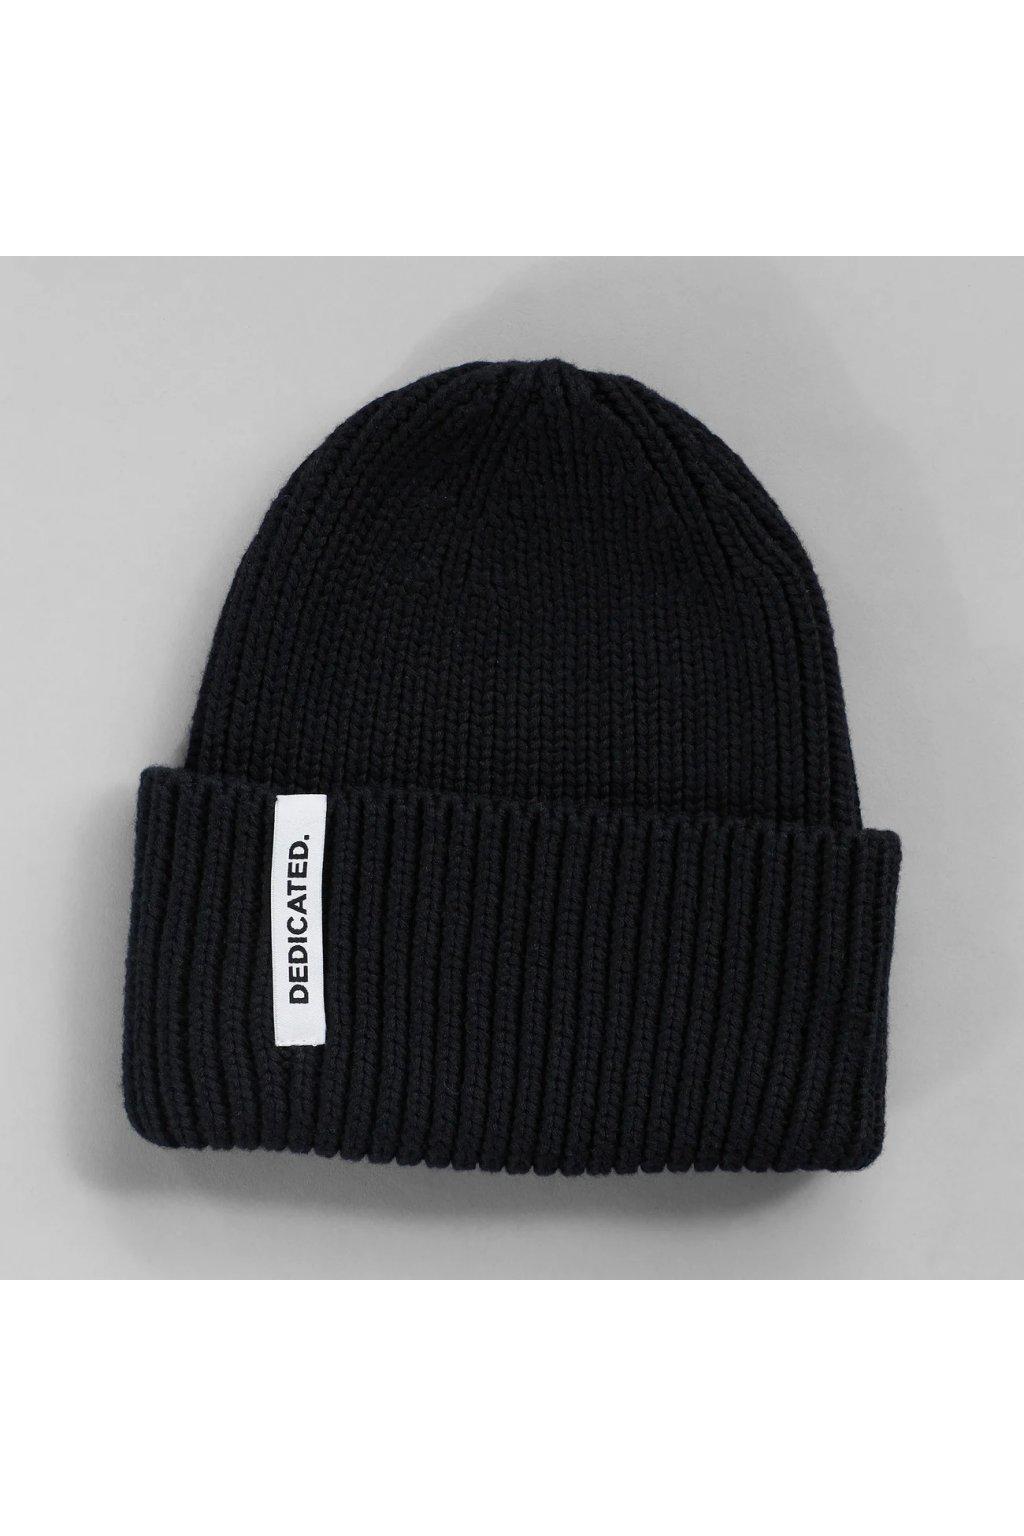 narvik black1